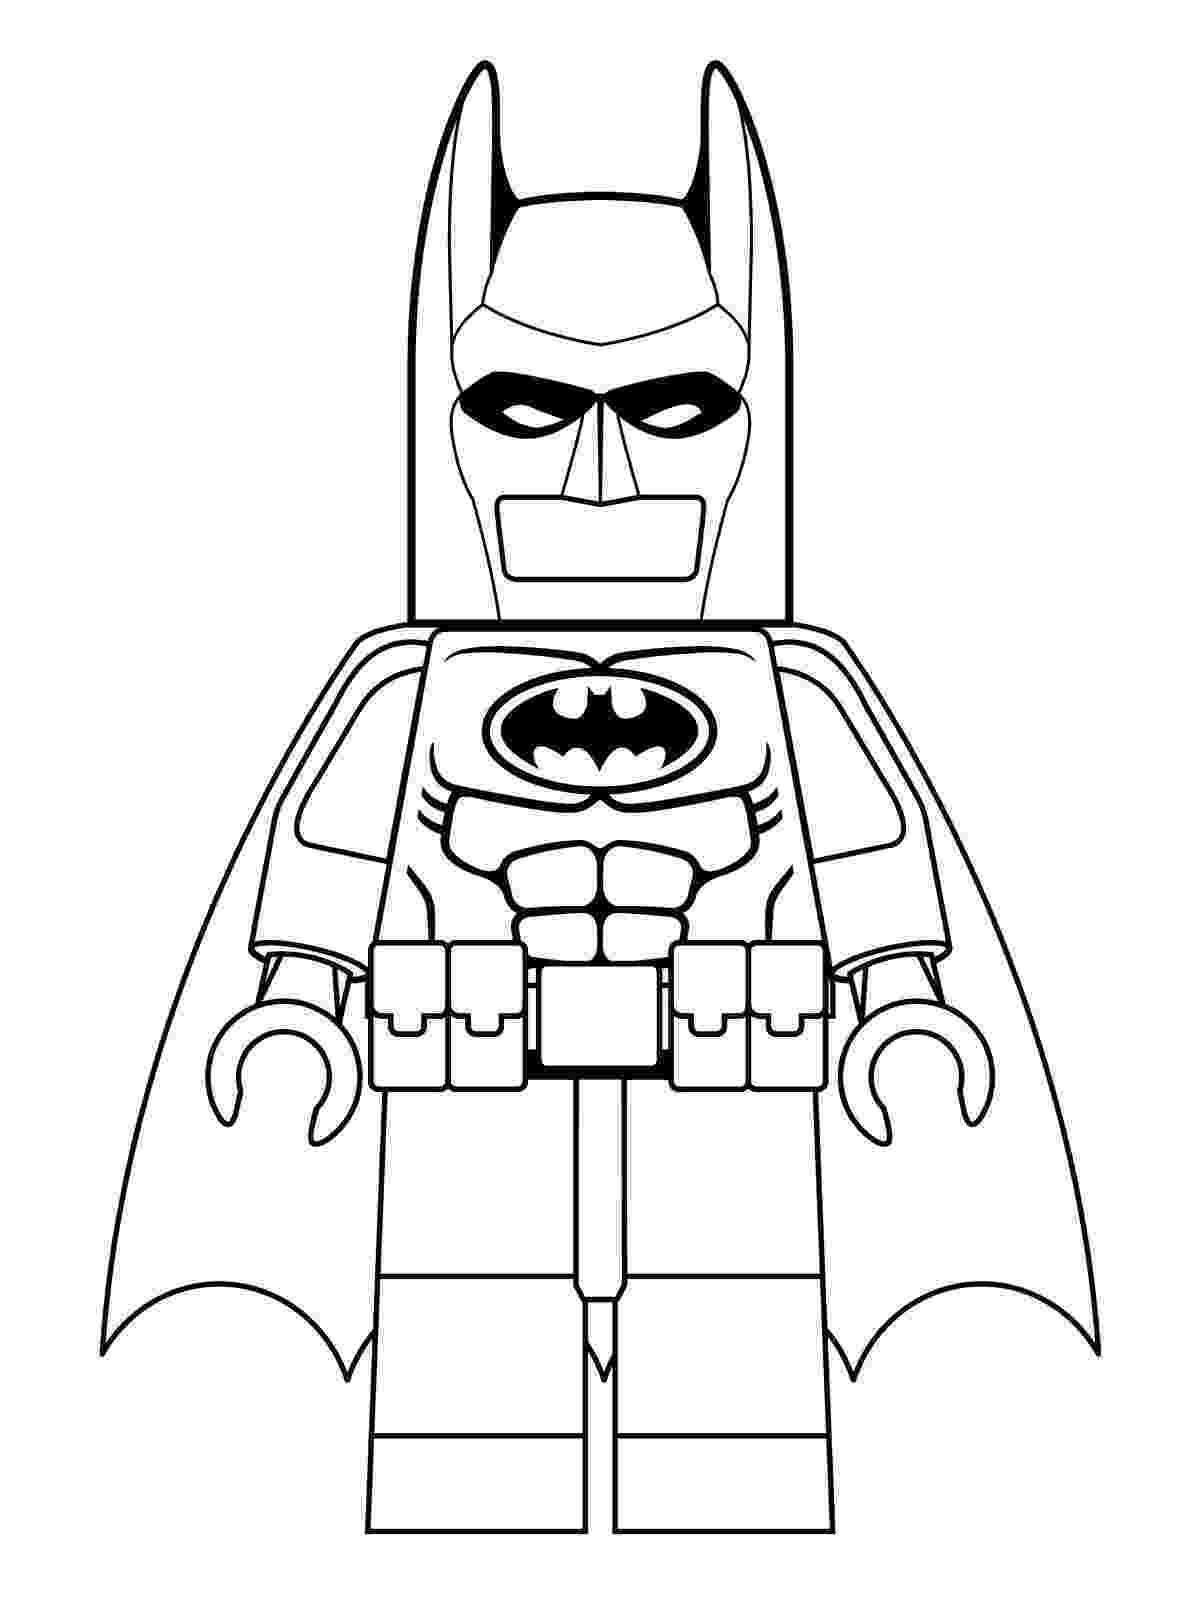 coloring pages for batman coloring pages for batman batman pages coloring for